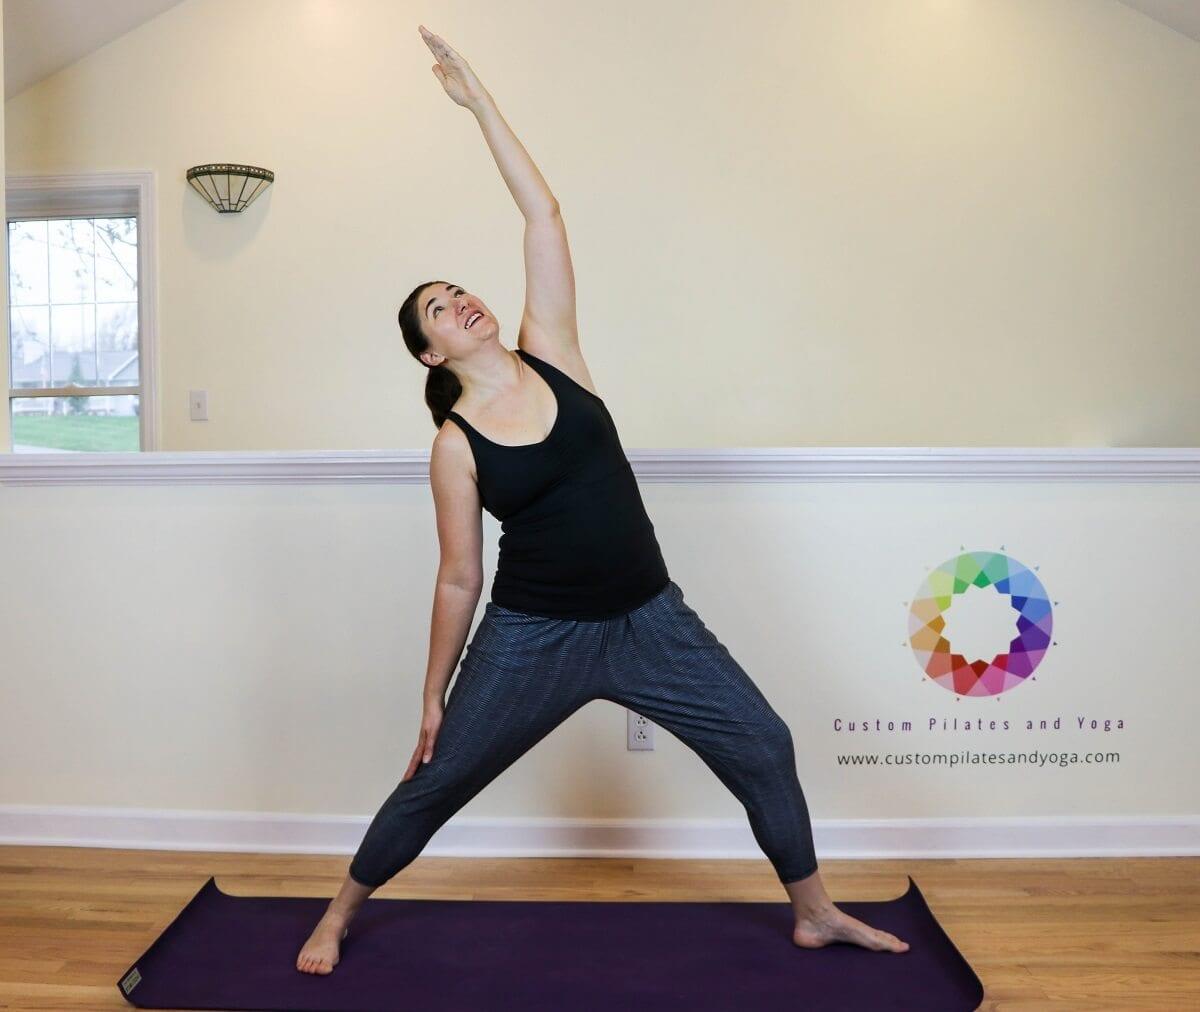 Sarah Stockett practicing reverse warrior pose